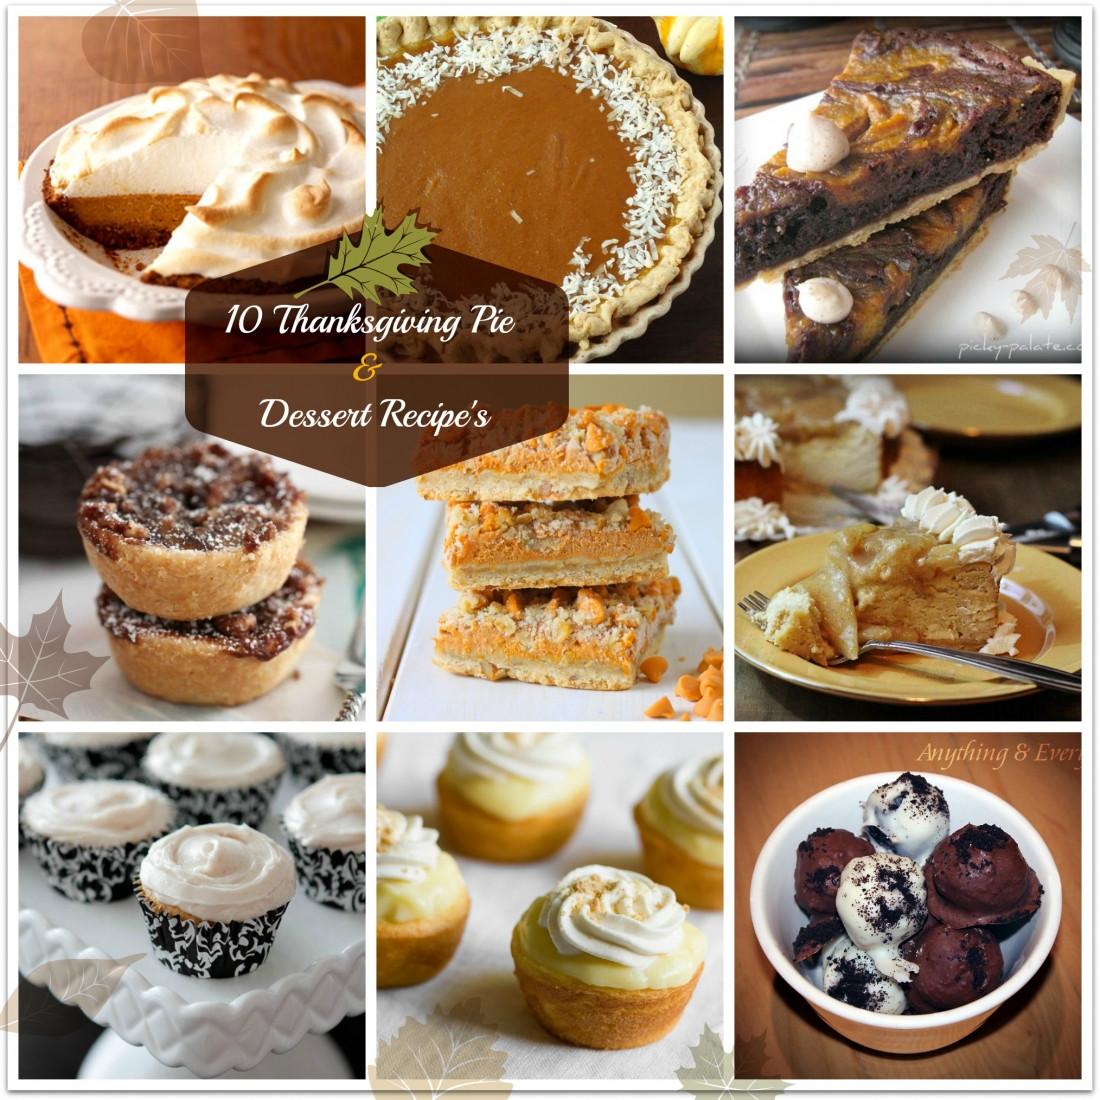 Thanksgiving Dessert Recipes  10 Thanksgiving Pie & Dessert Recipes ‹ Anything & Everything